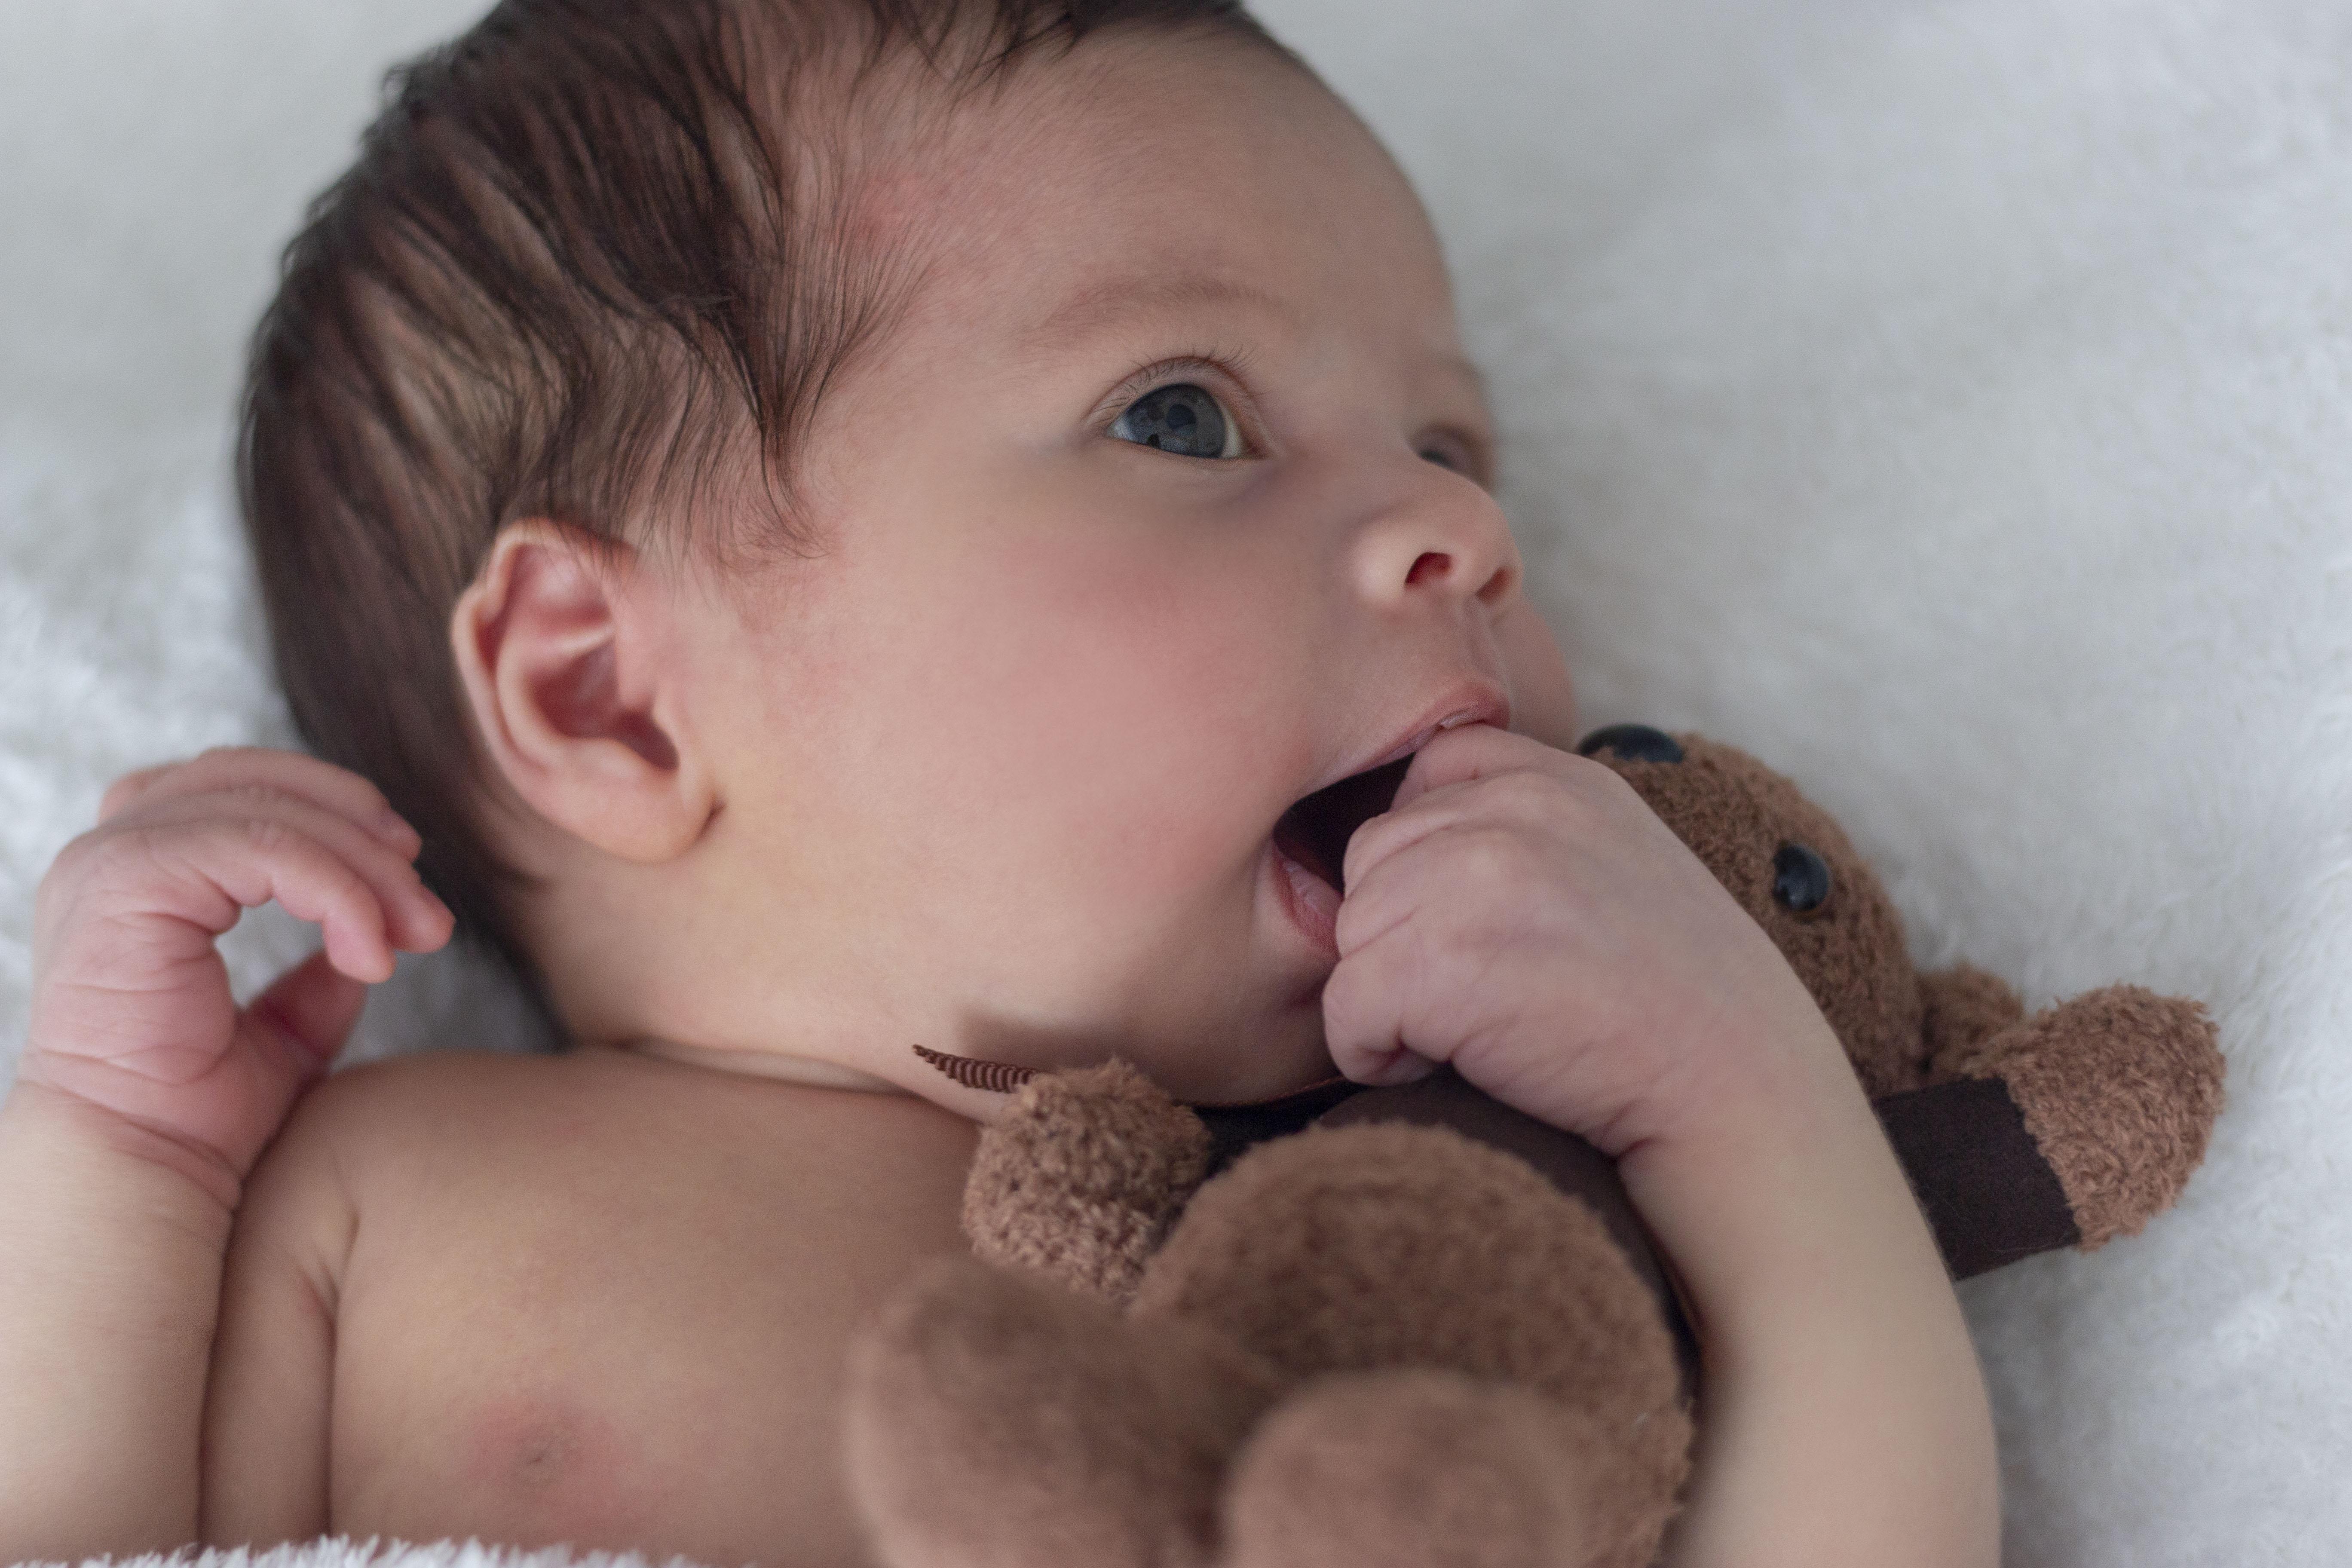 sesiones de fotos para bebes, sesion de fotos para bebes, fotografia newborn